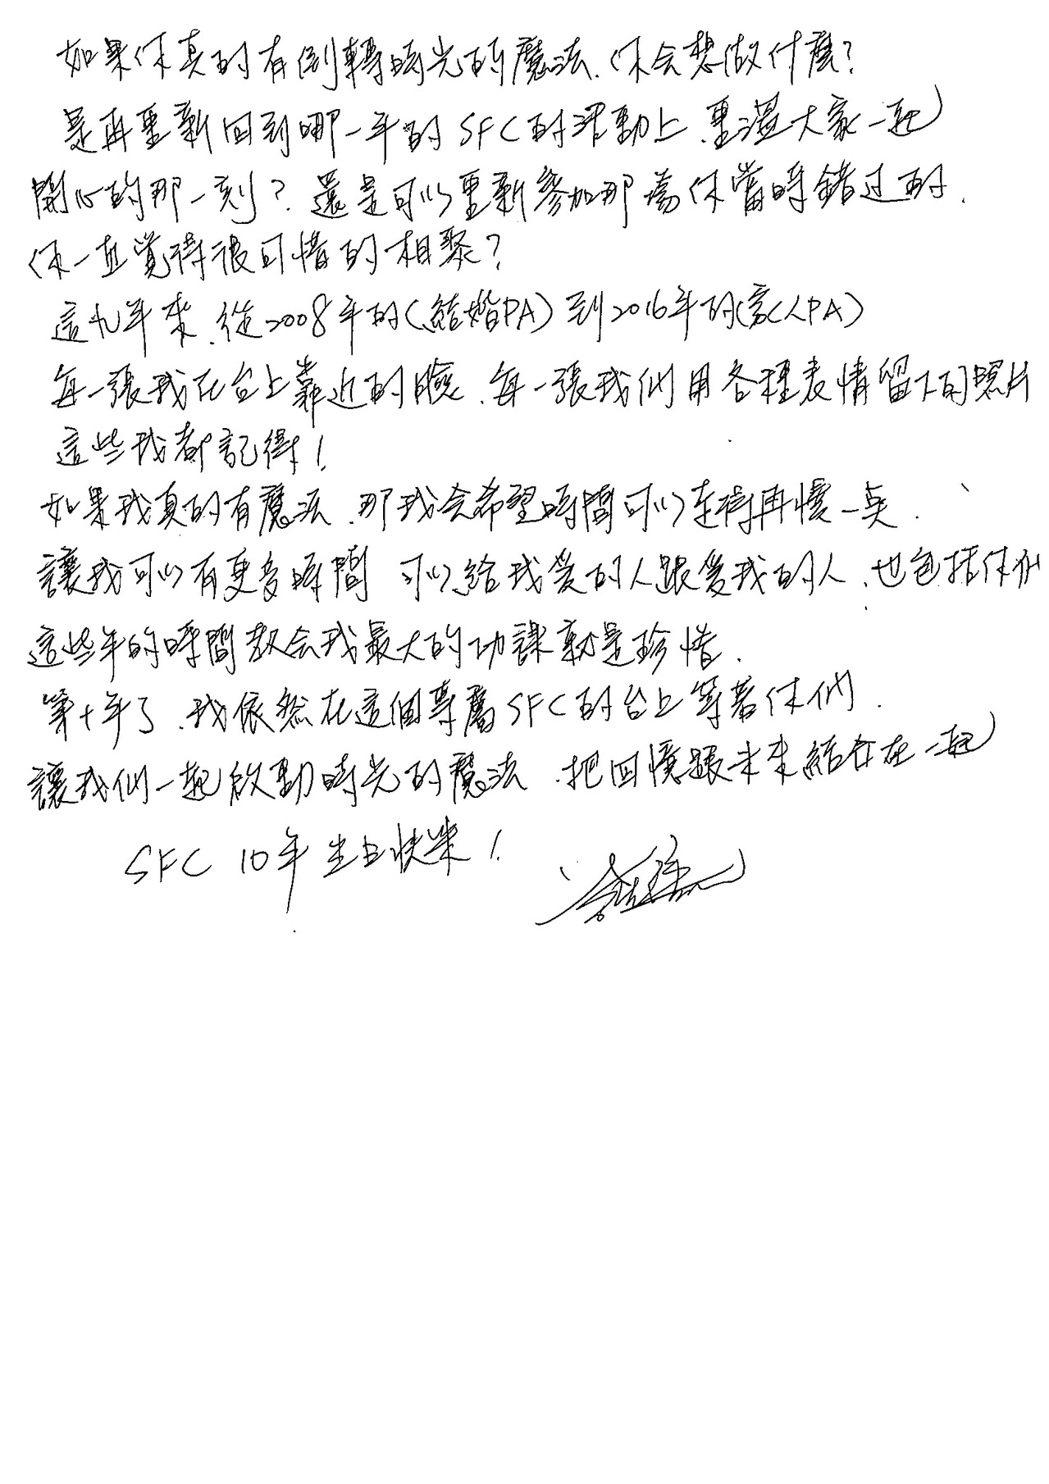 S.F.C成立10周年羅志祥扮魔法師,寫手稿邀粉絲啟動時光魔法。圖/天地合提供